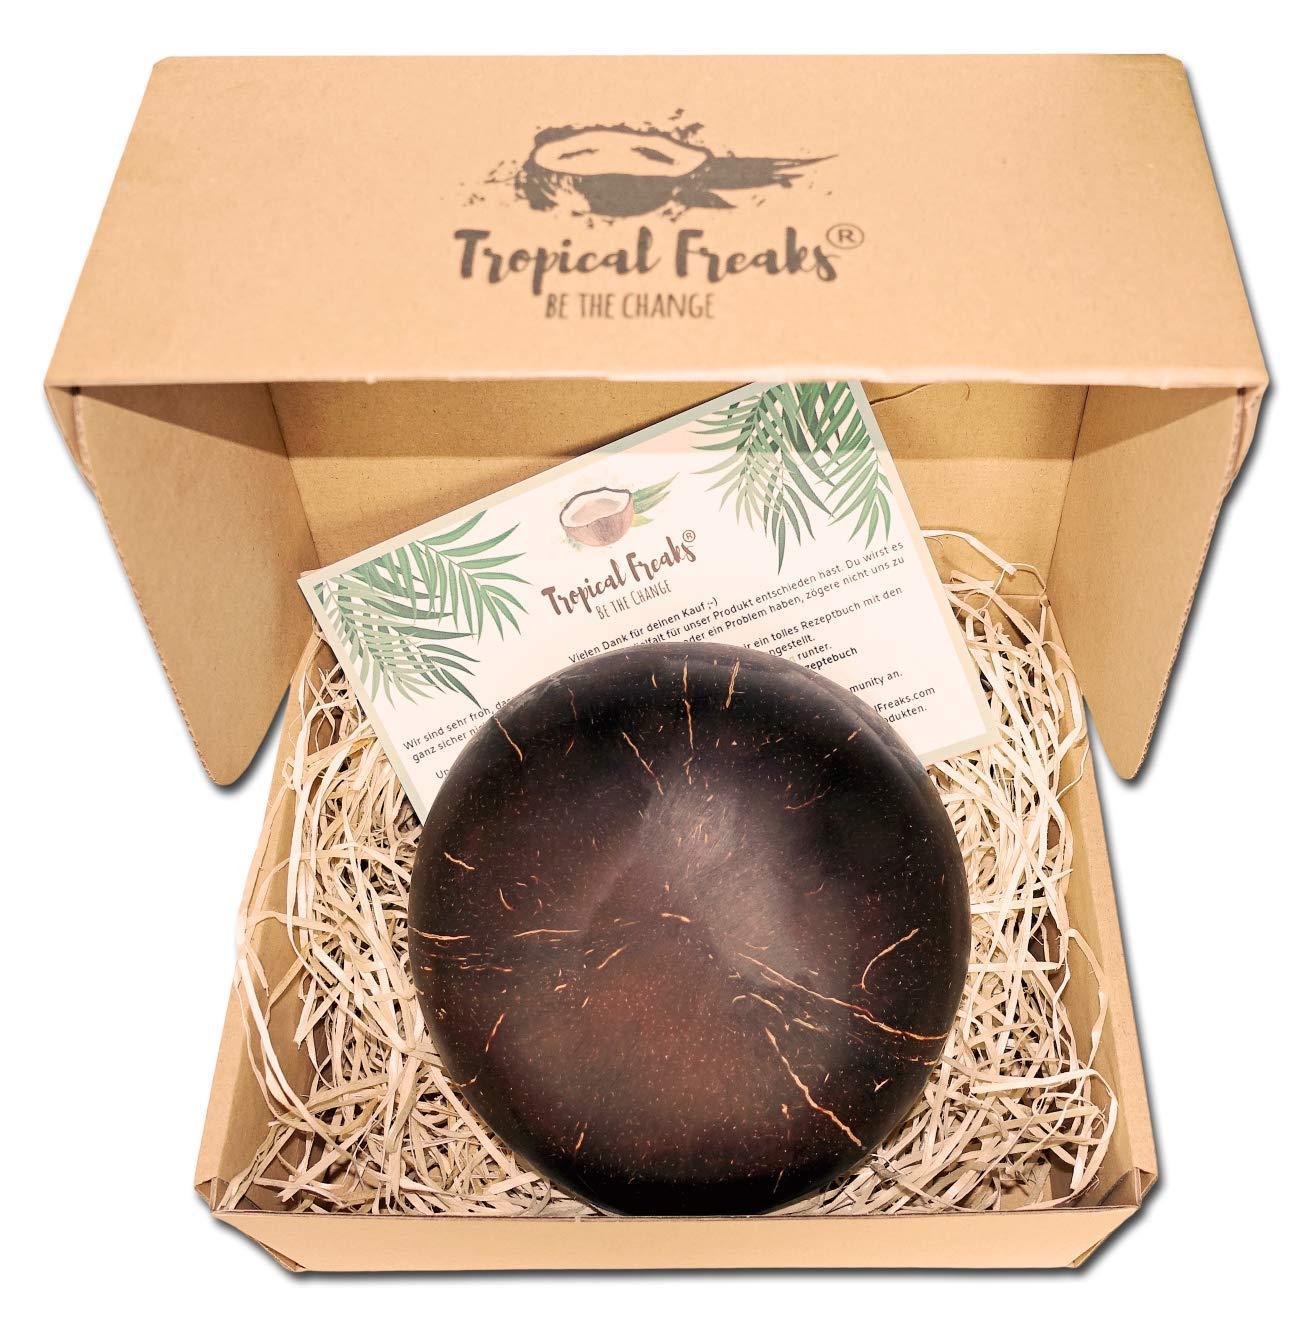 100/% Naturel Bol /à muesli Naturel Coconut Bowl Tropical Freaks/® Bol en Noix de Coco Bouddha Bowl